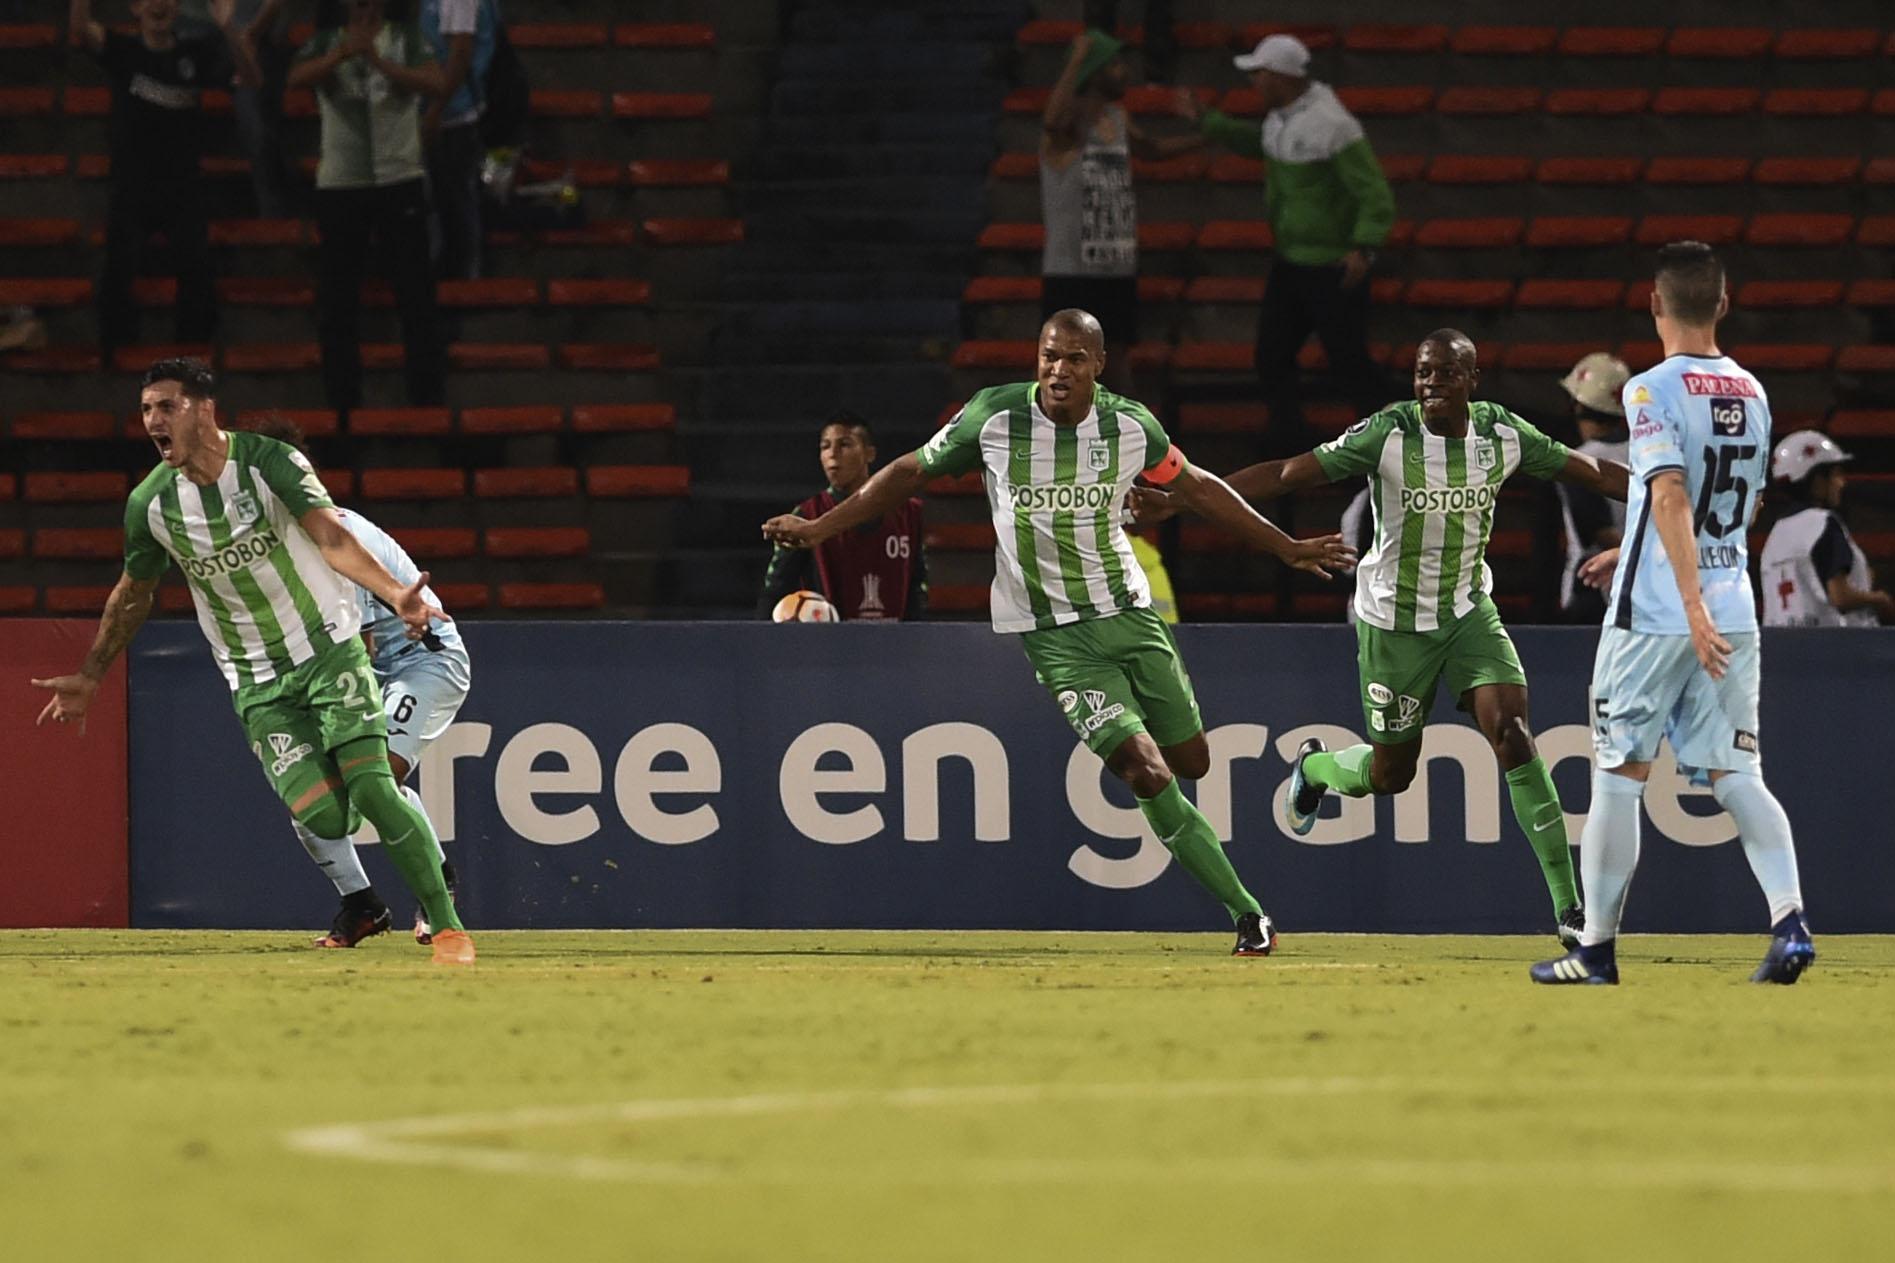 Atlético Nacional vs  Bollívar gol Gonzalo Castellani